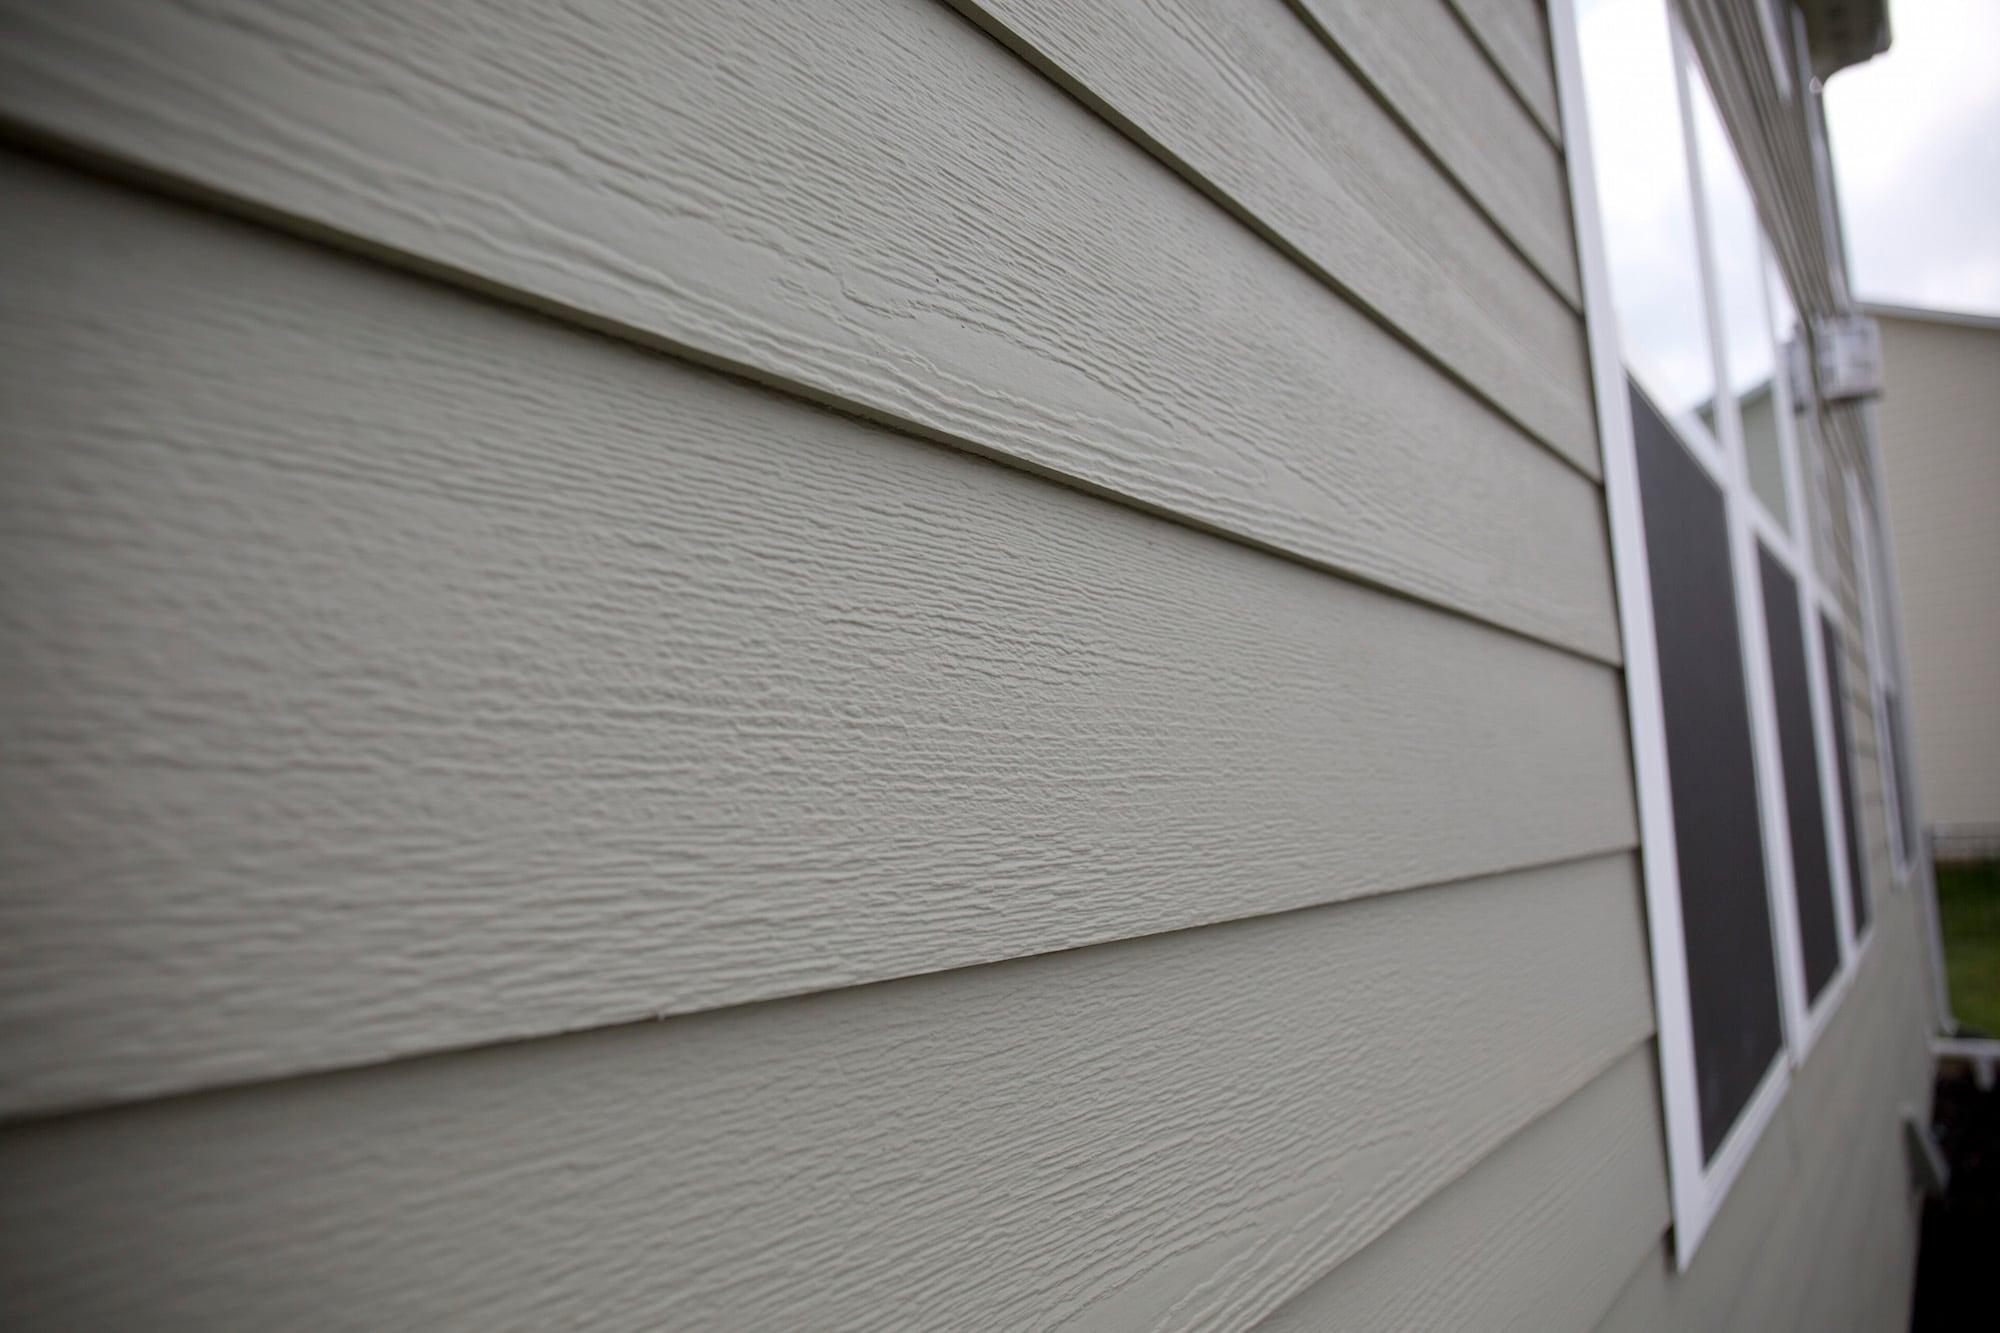 Fiber Cement Siding Cost Amp Free Contractor Quotes Jocoxloneliness